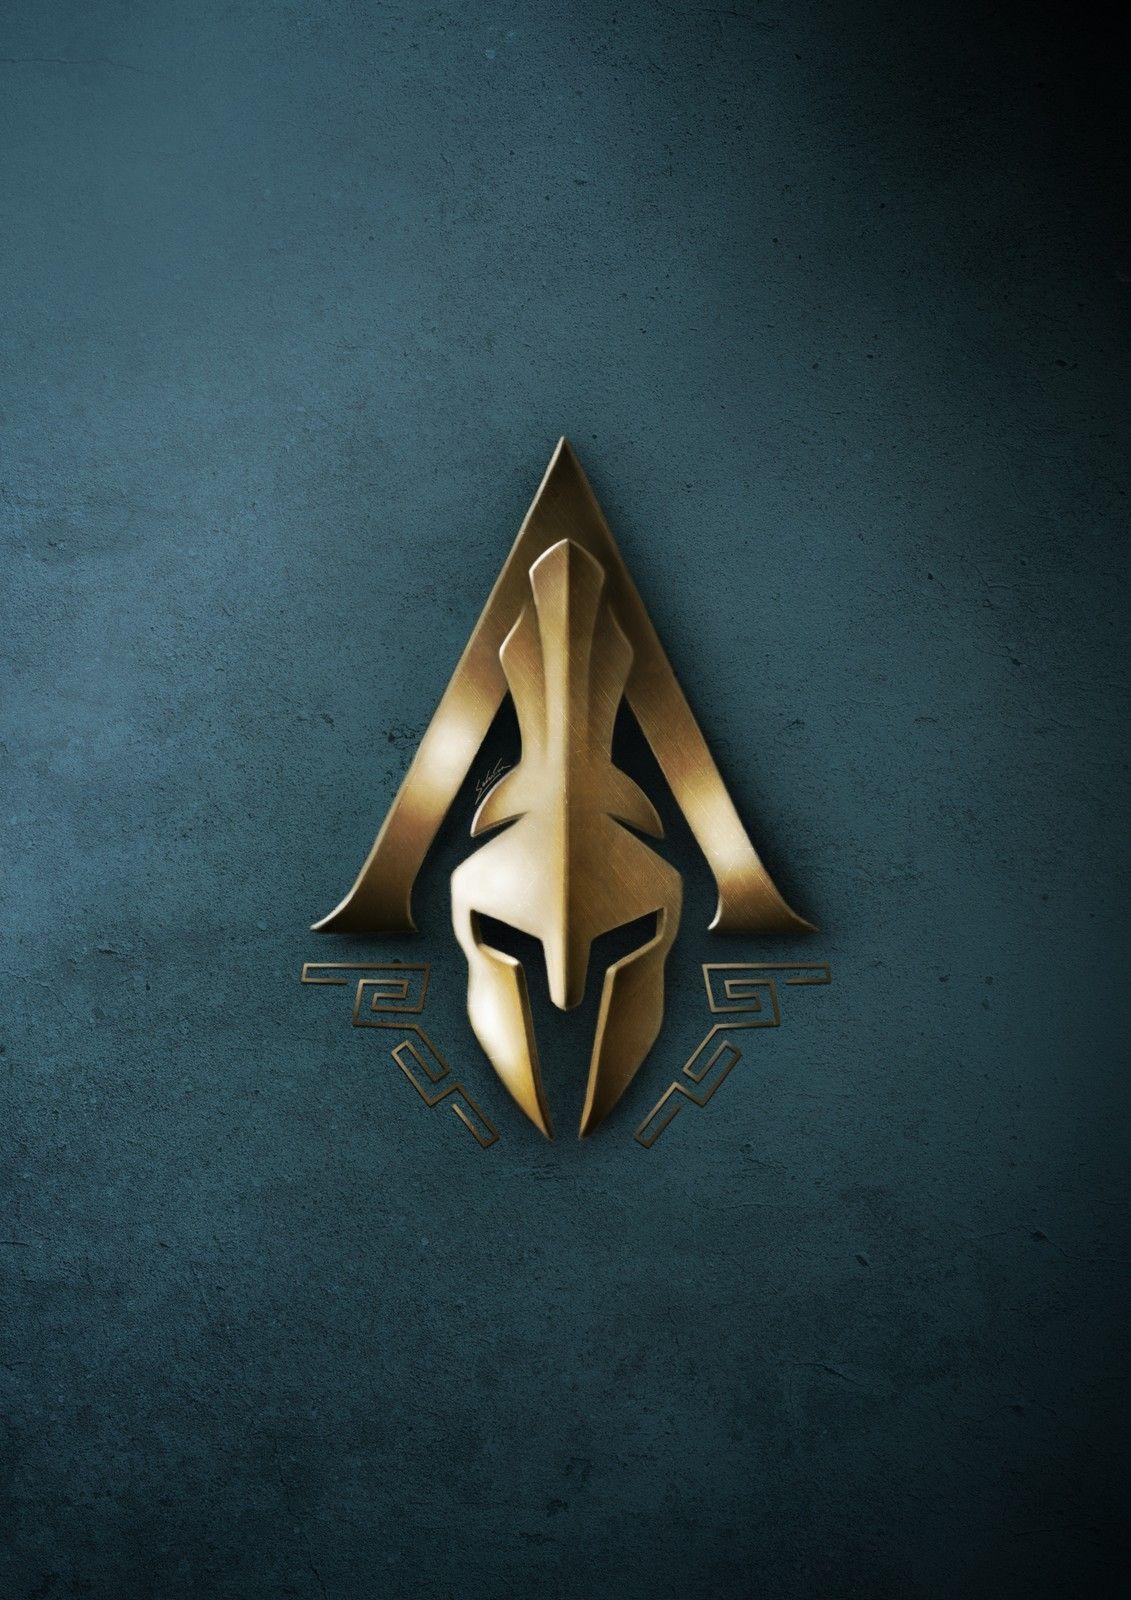 Pin by Tomás Molina on Assassin's Creed Assassins creed